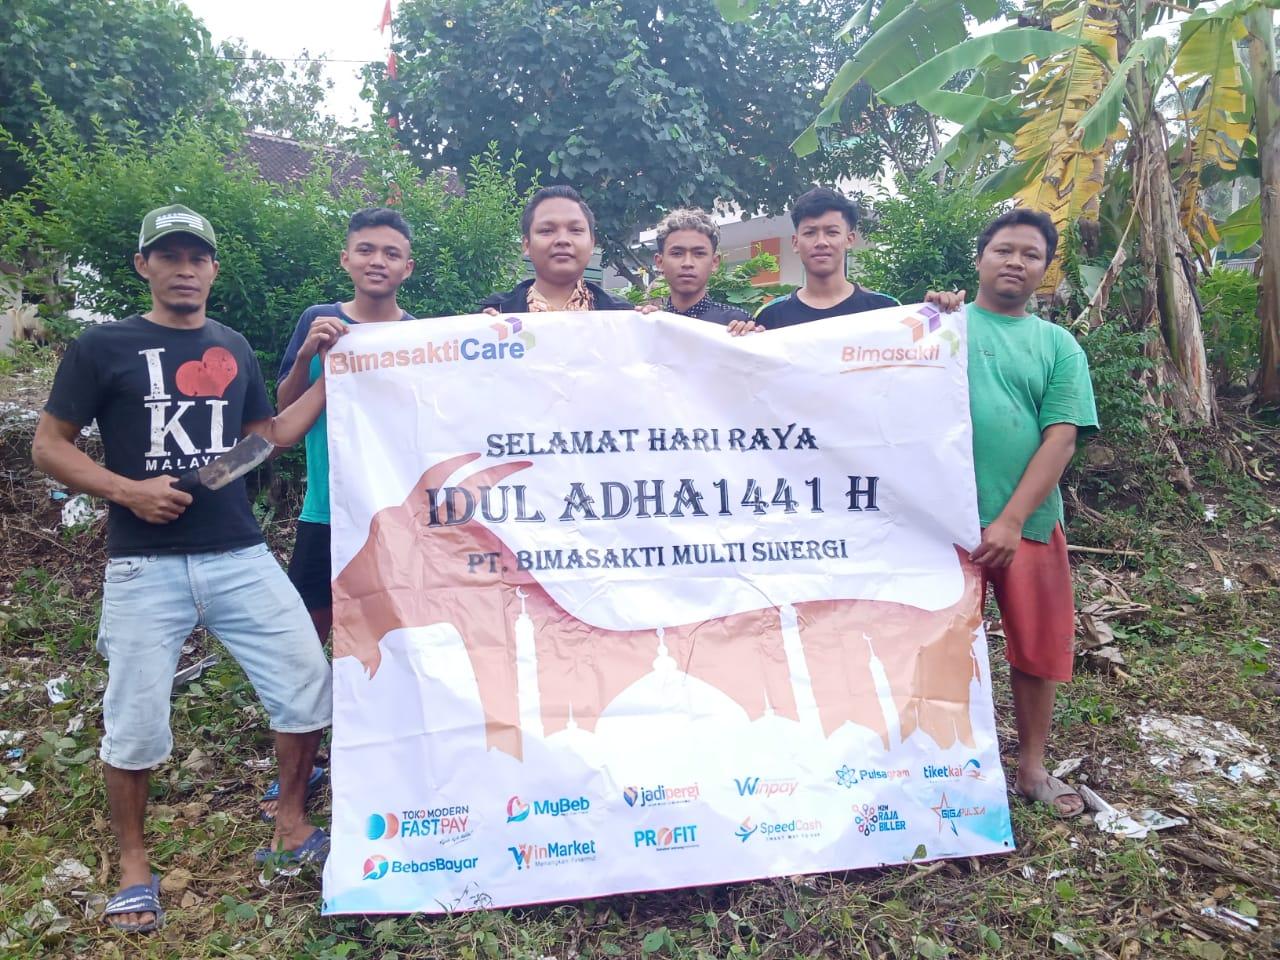 Peringatan Hari Raya Idul Adha 1441 H, Bimasakticare Salurkan Hewan Qurban di Daerah 3T